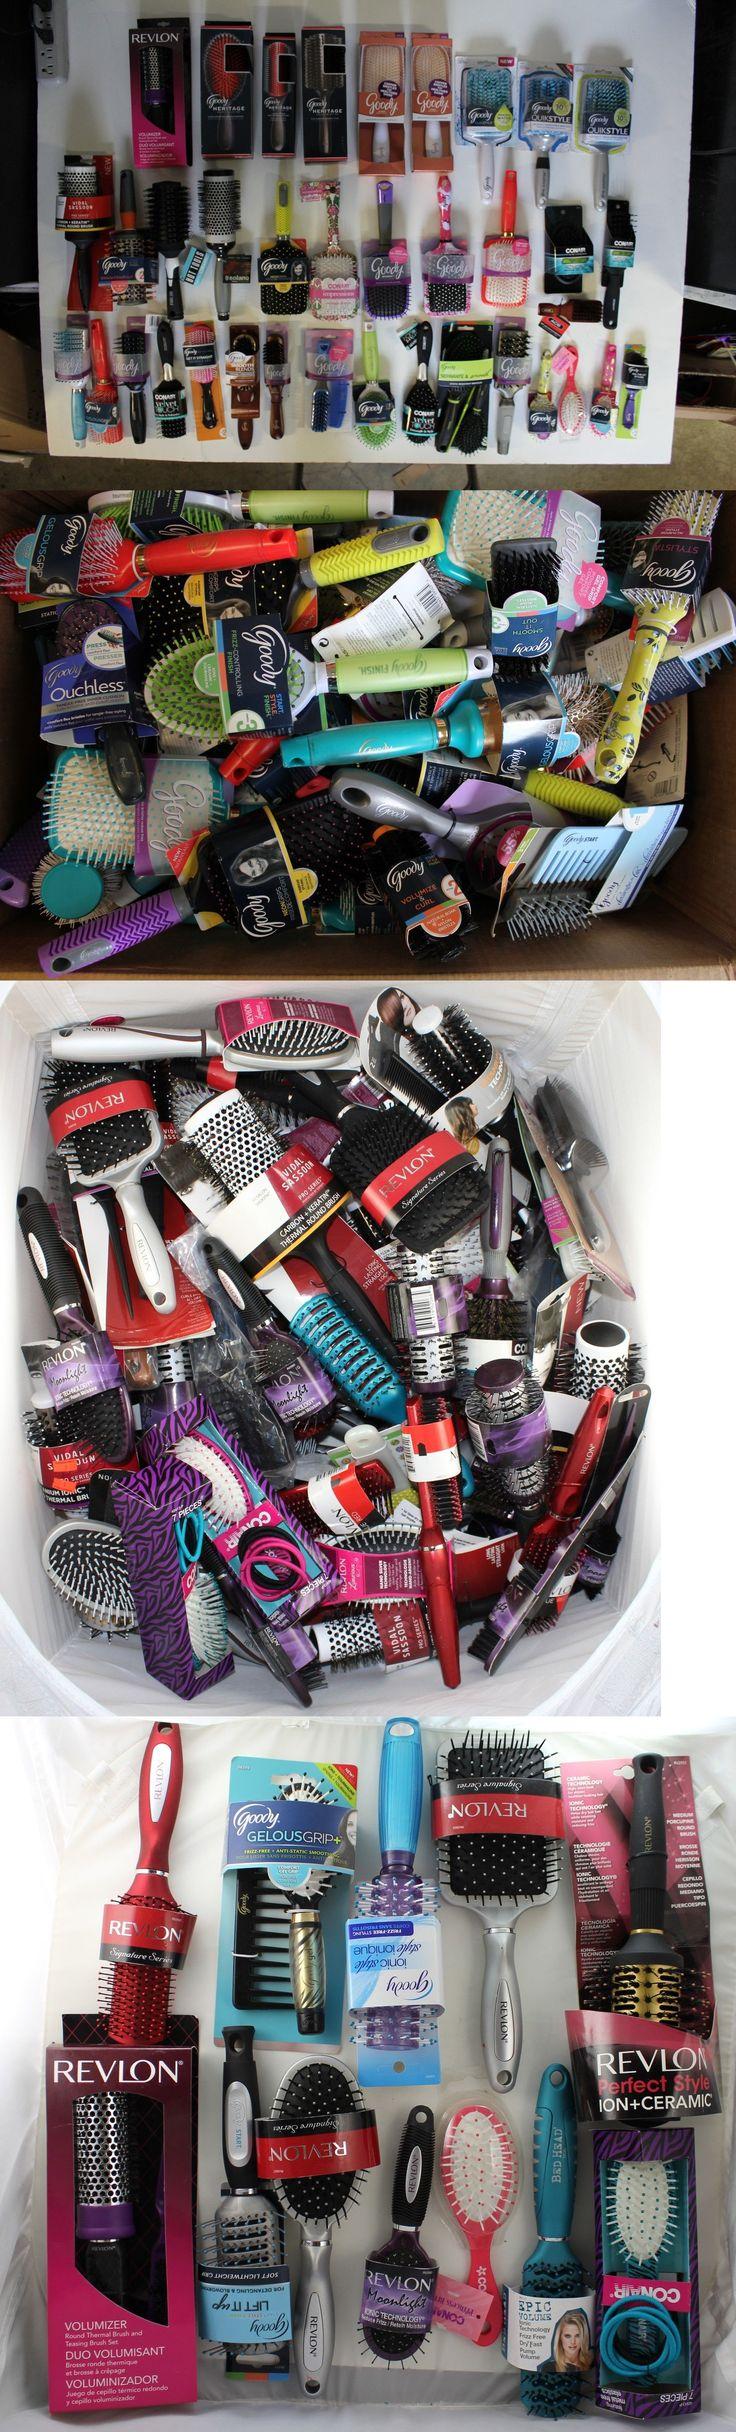 wholesale Hair Care: Bulk Wholesale Lot Of 100 Goody, Conair, Revlon, Vidal Sassoon Women Hair Brush -> BUY IT NOW ONLY: $150.0 on eBay!